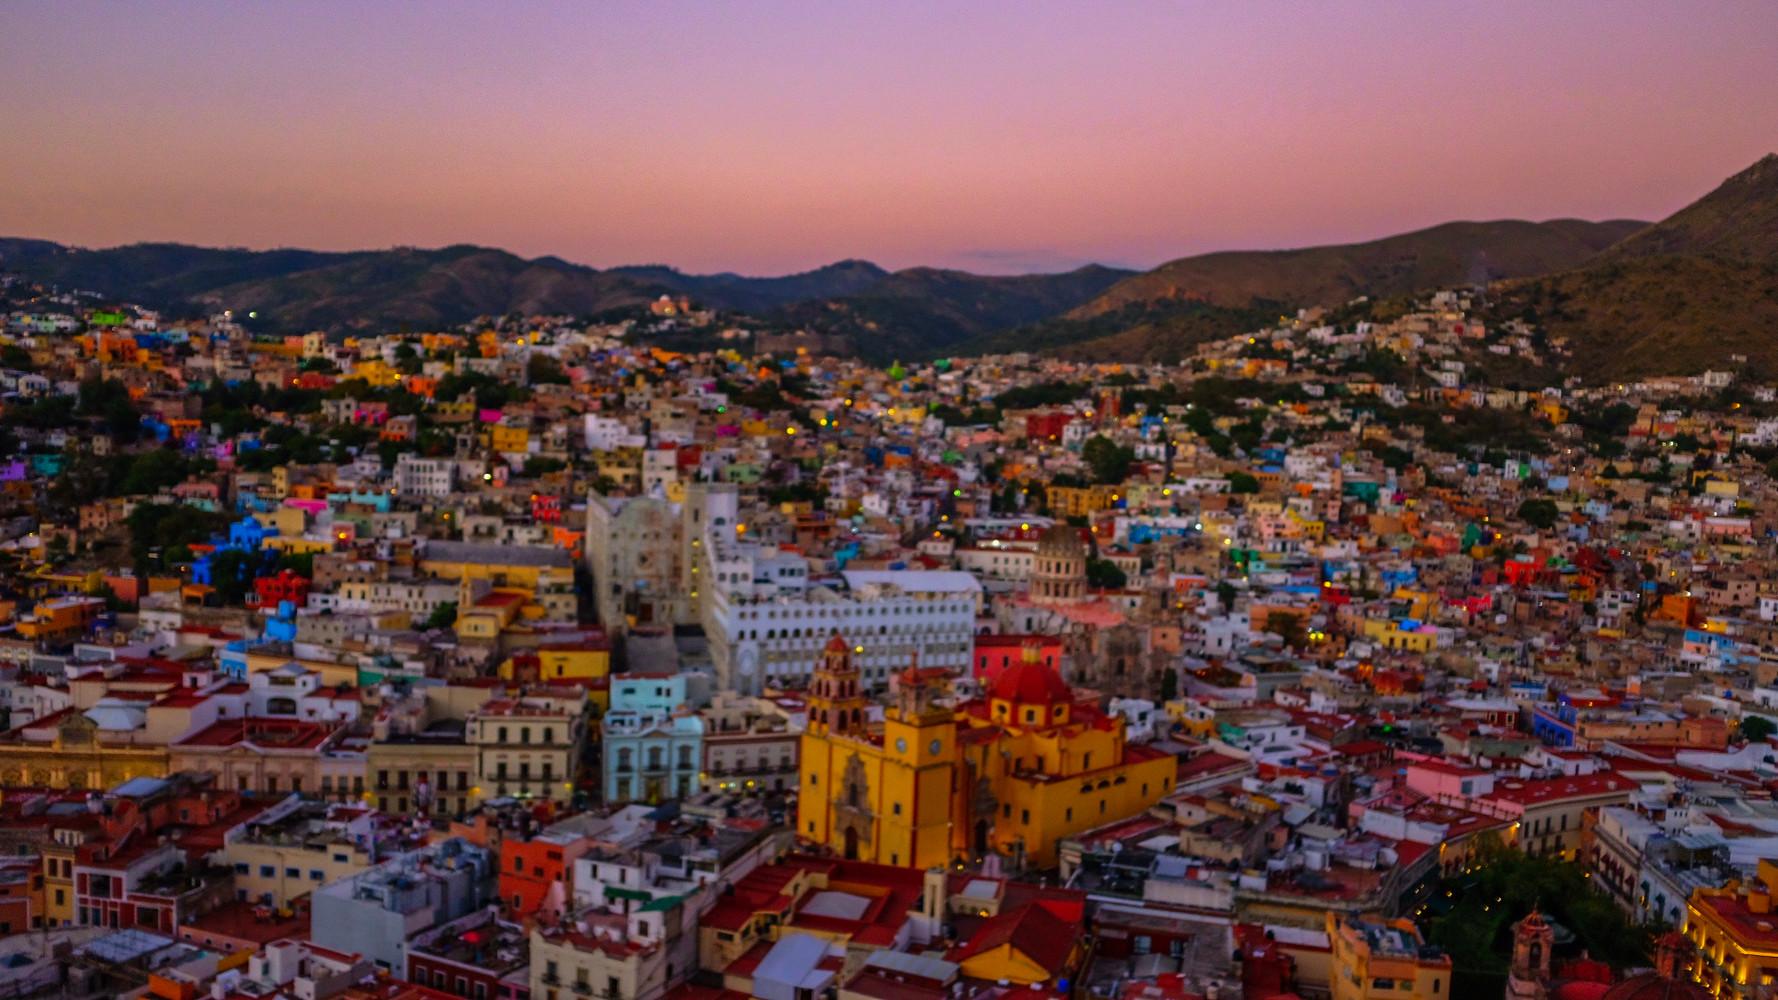 Sunset at Guanajuato